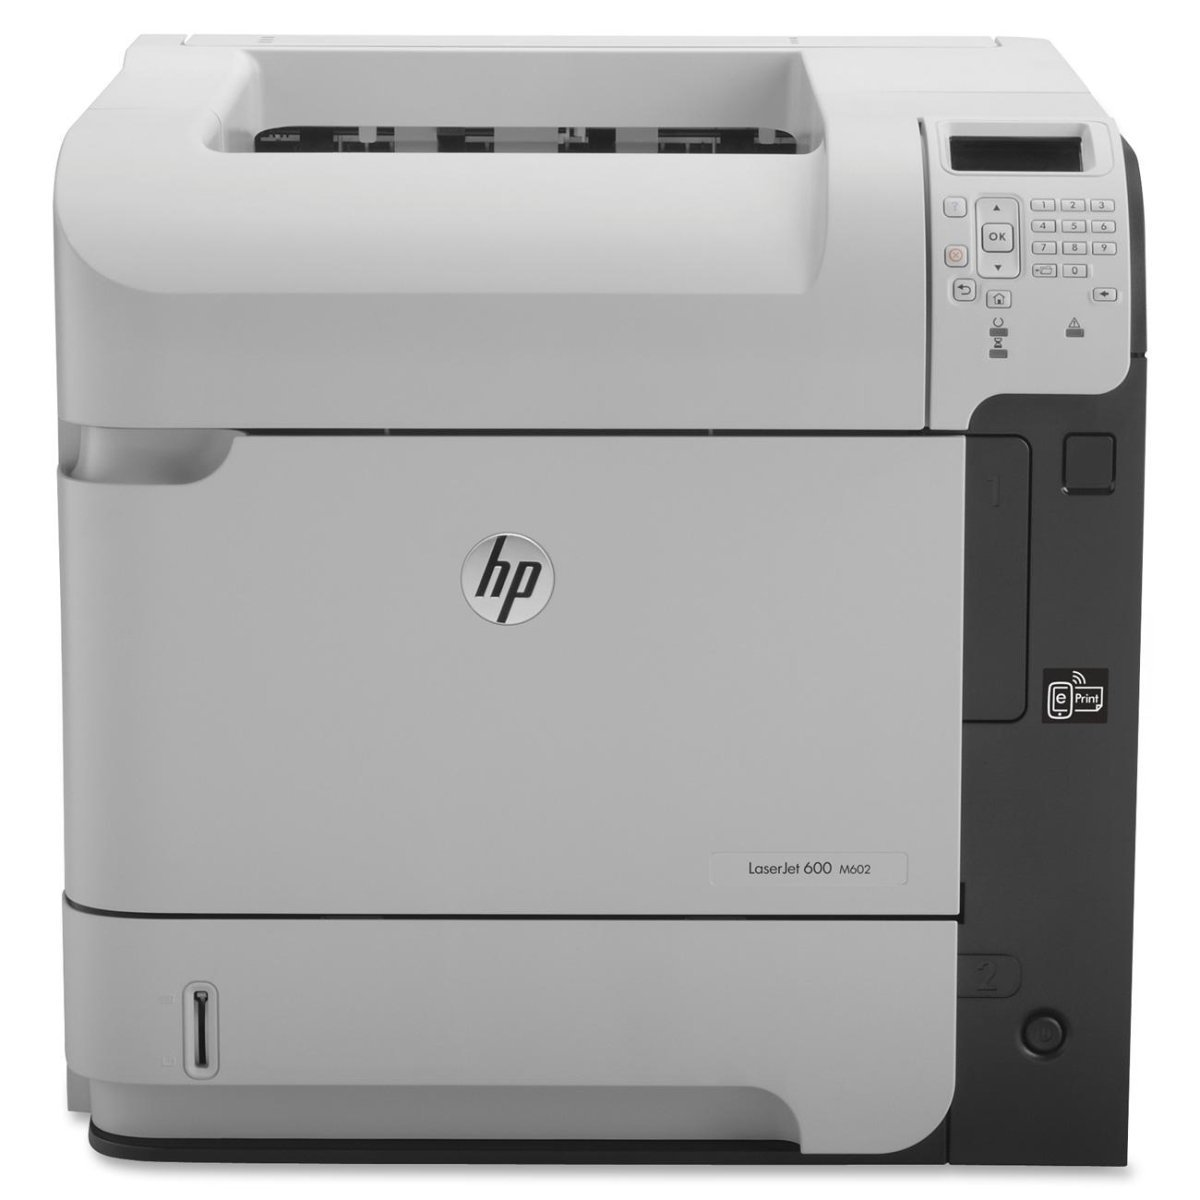 HP LaserJet 600 M602 大幅にプライスダウン Laser Renewed CE992A 新発売 Printer